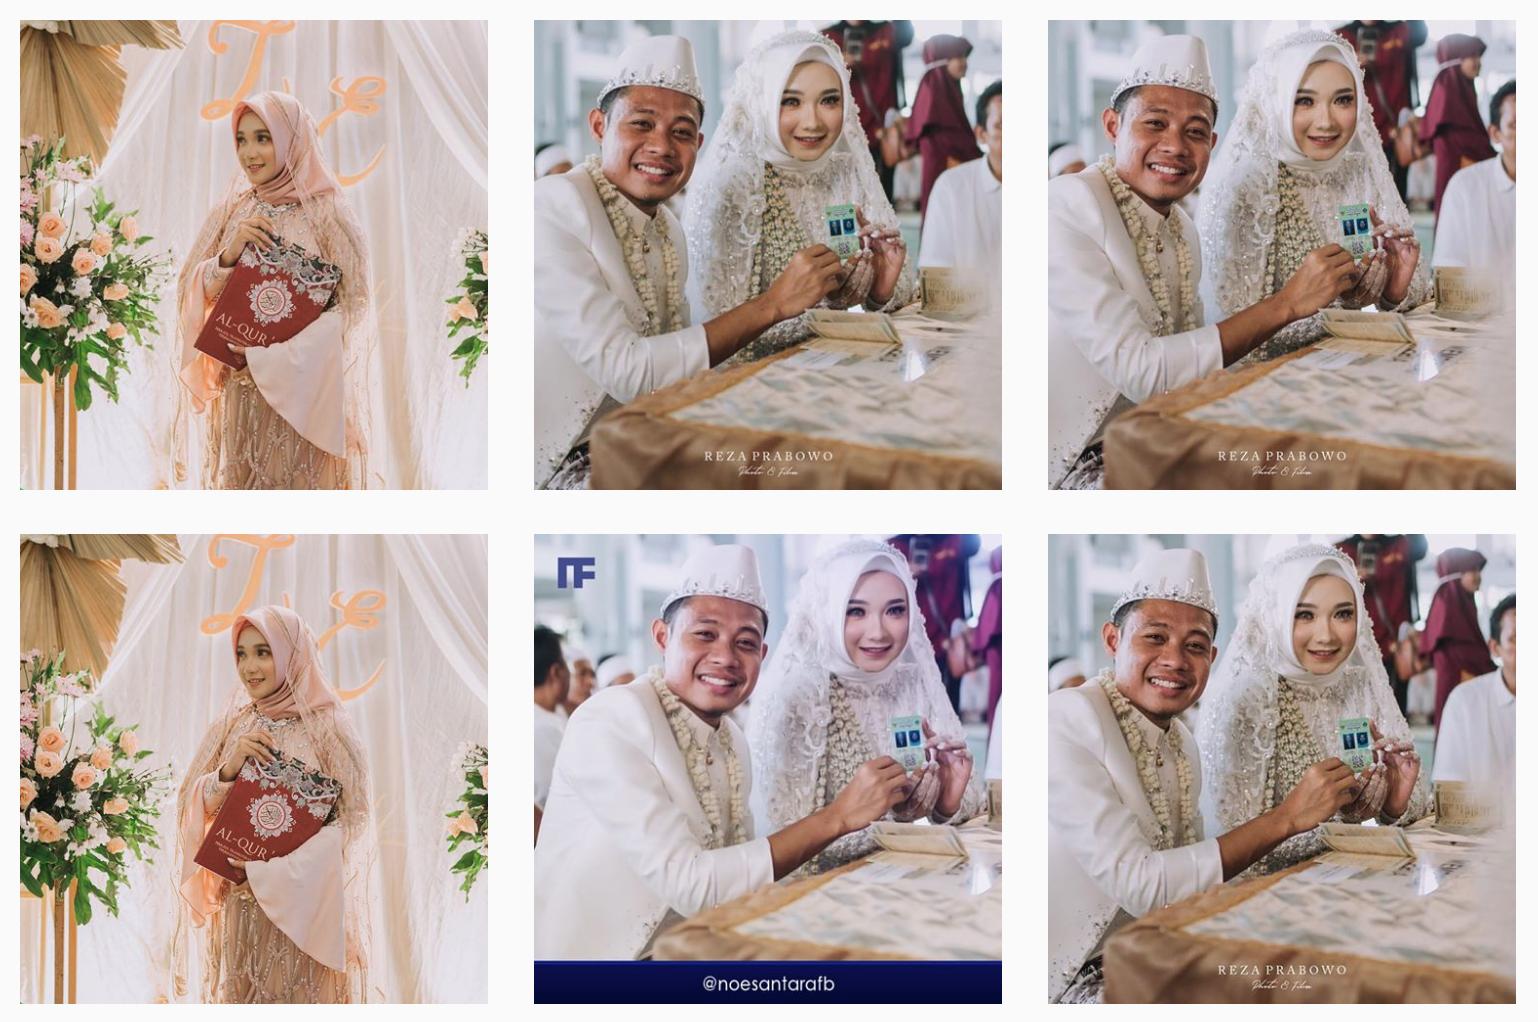 Kolase foto Evan Dimas menikah | Foto Instragram